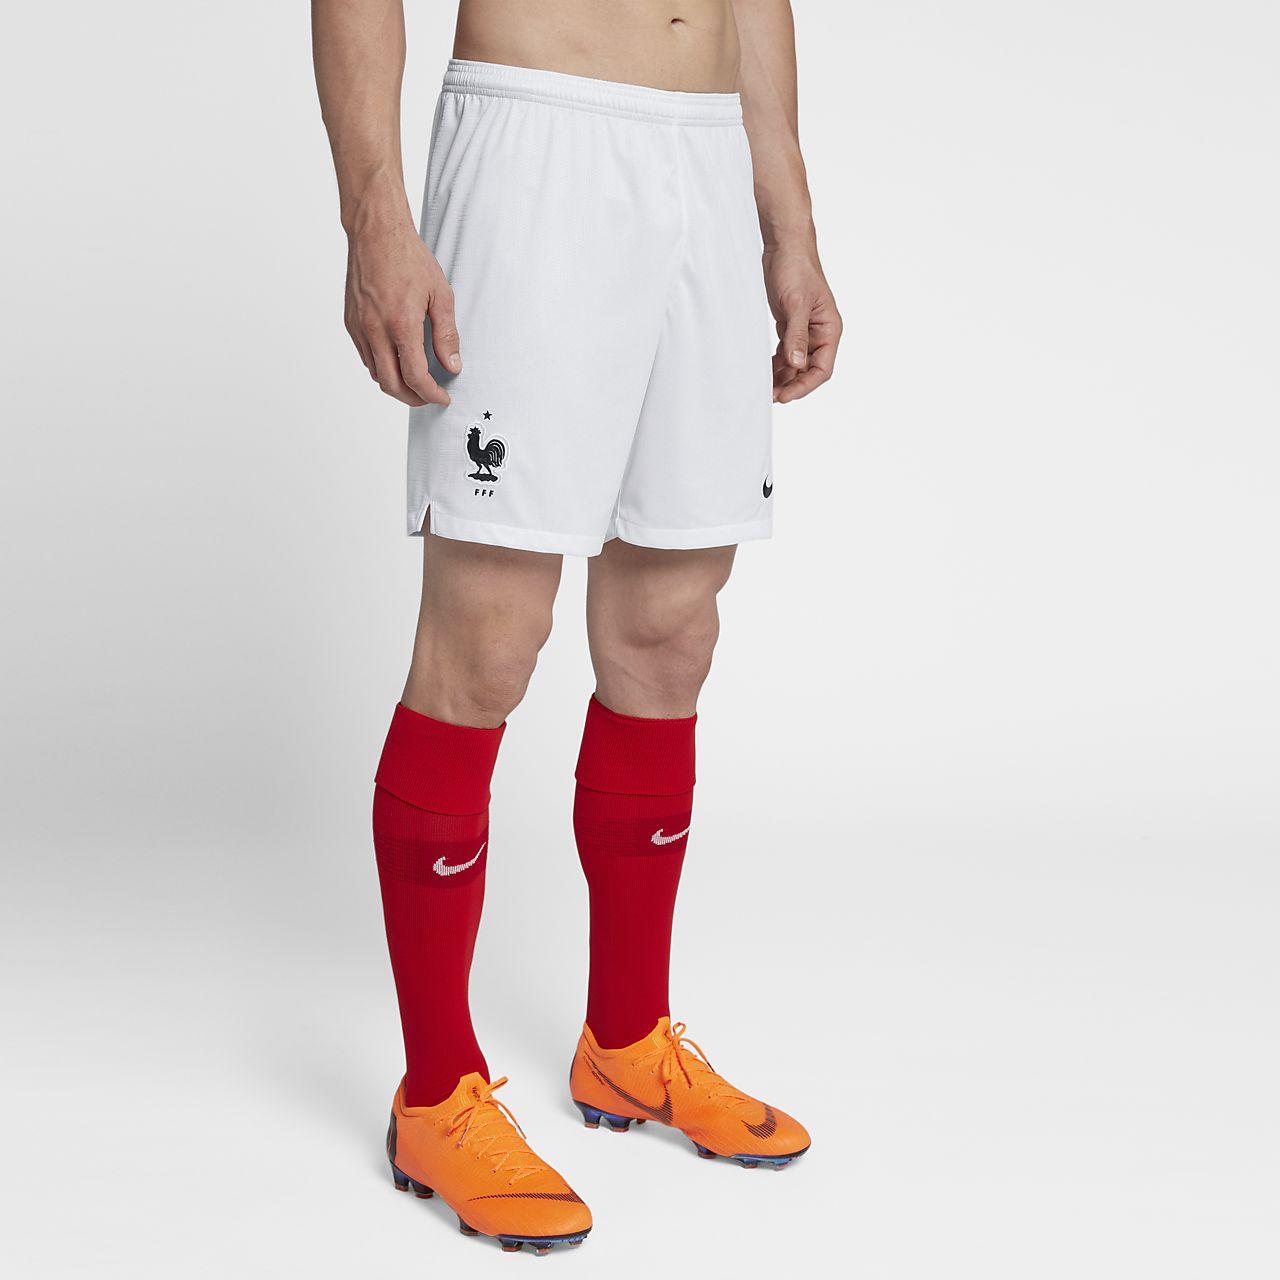 ... 2018 FFF Stadium Home Men s Soccer Shorts Nike com